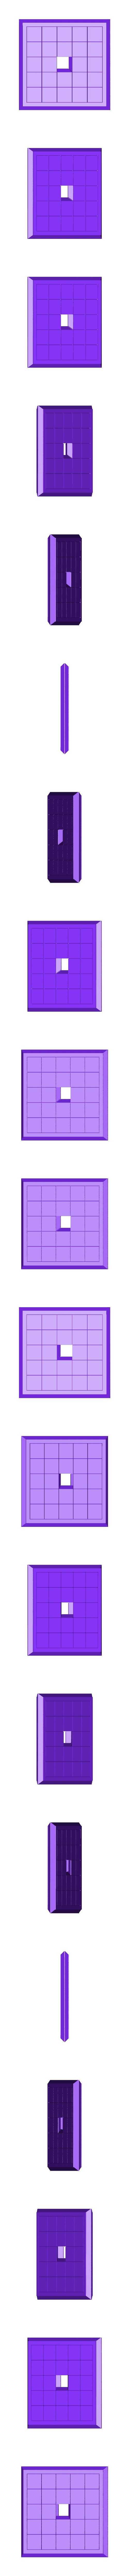 Sliding5x5BlankPuzzle3.stl Download STL file Two Sided Sliding Puzzle • 3D printable model, Jinja